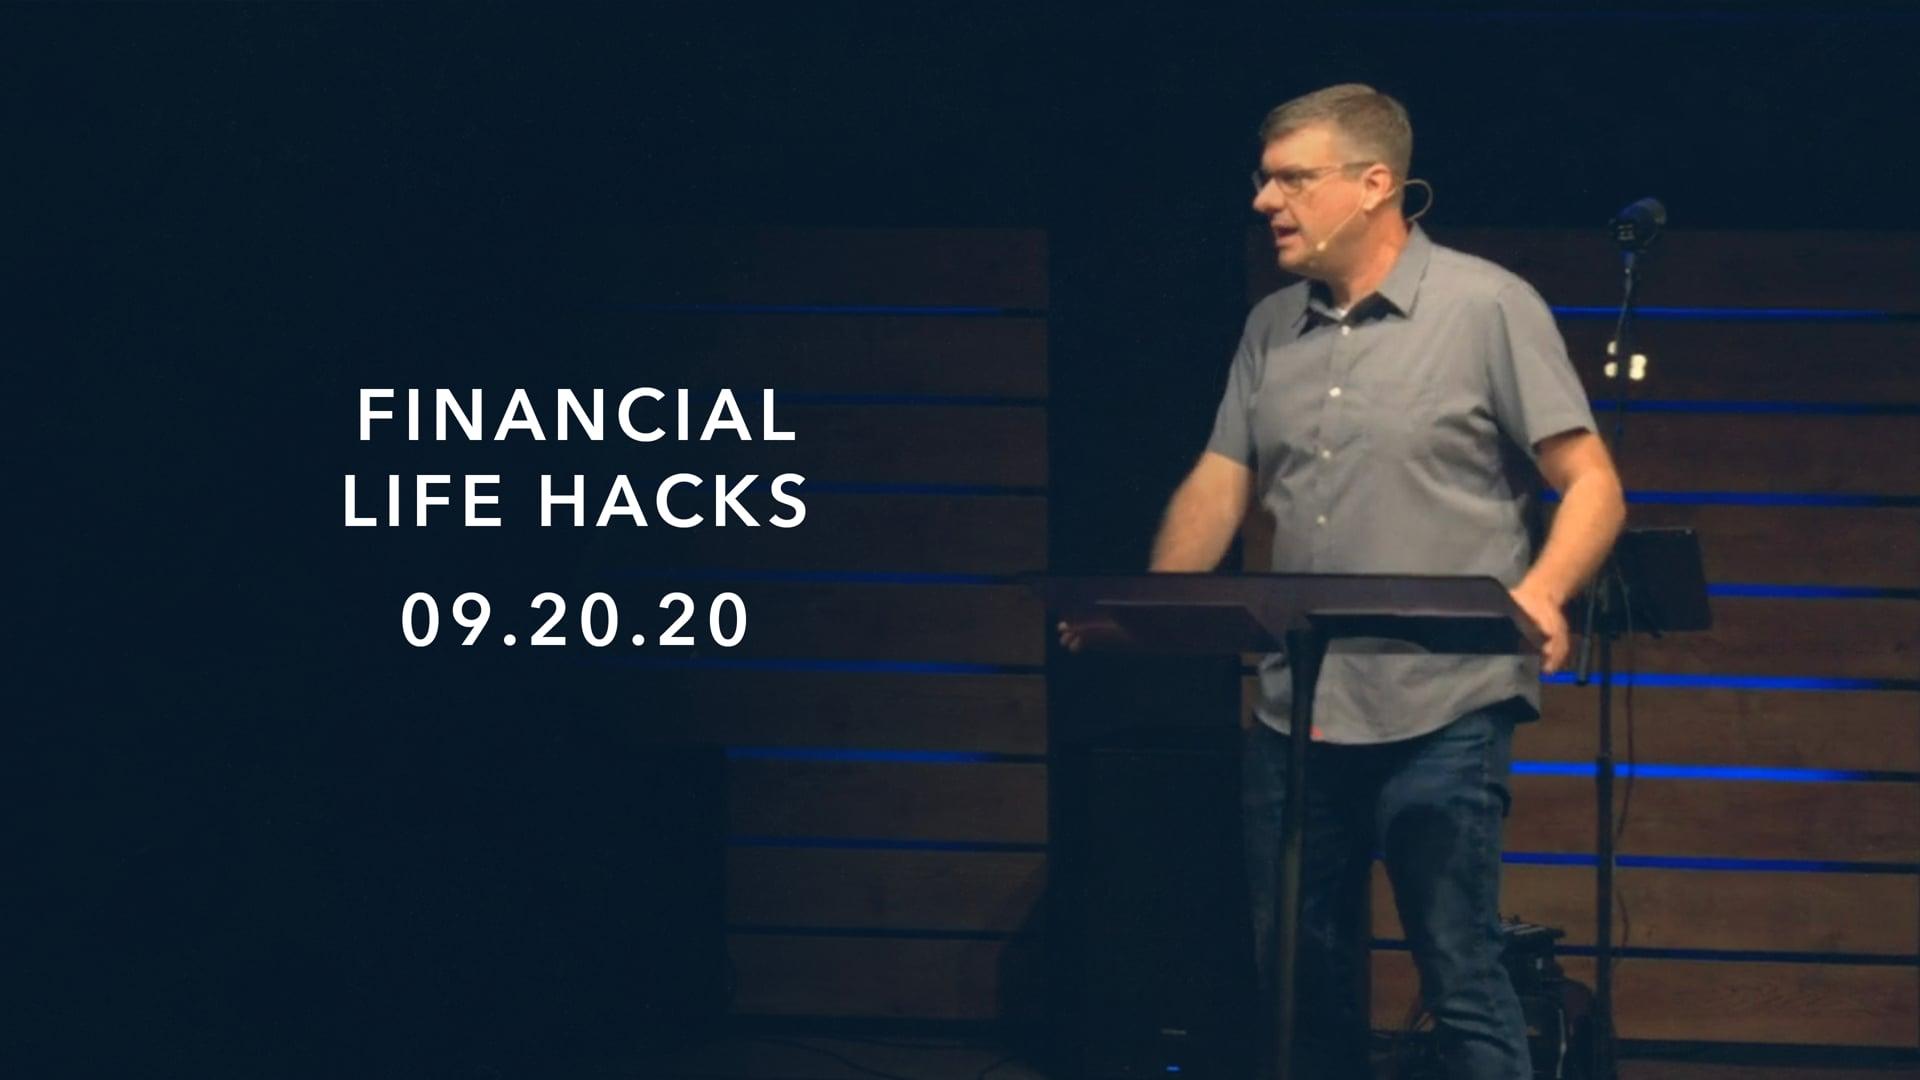 Financial Life Hack